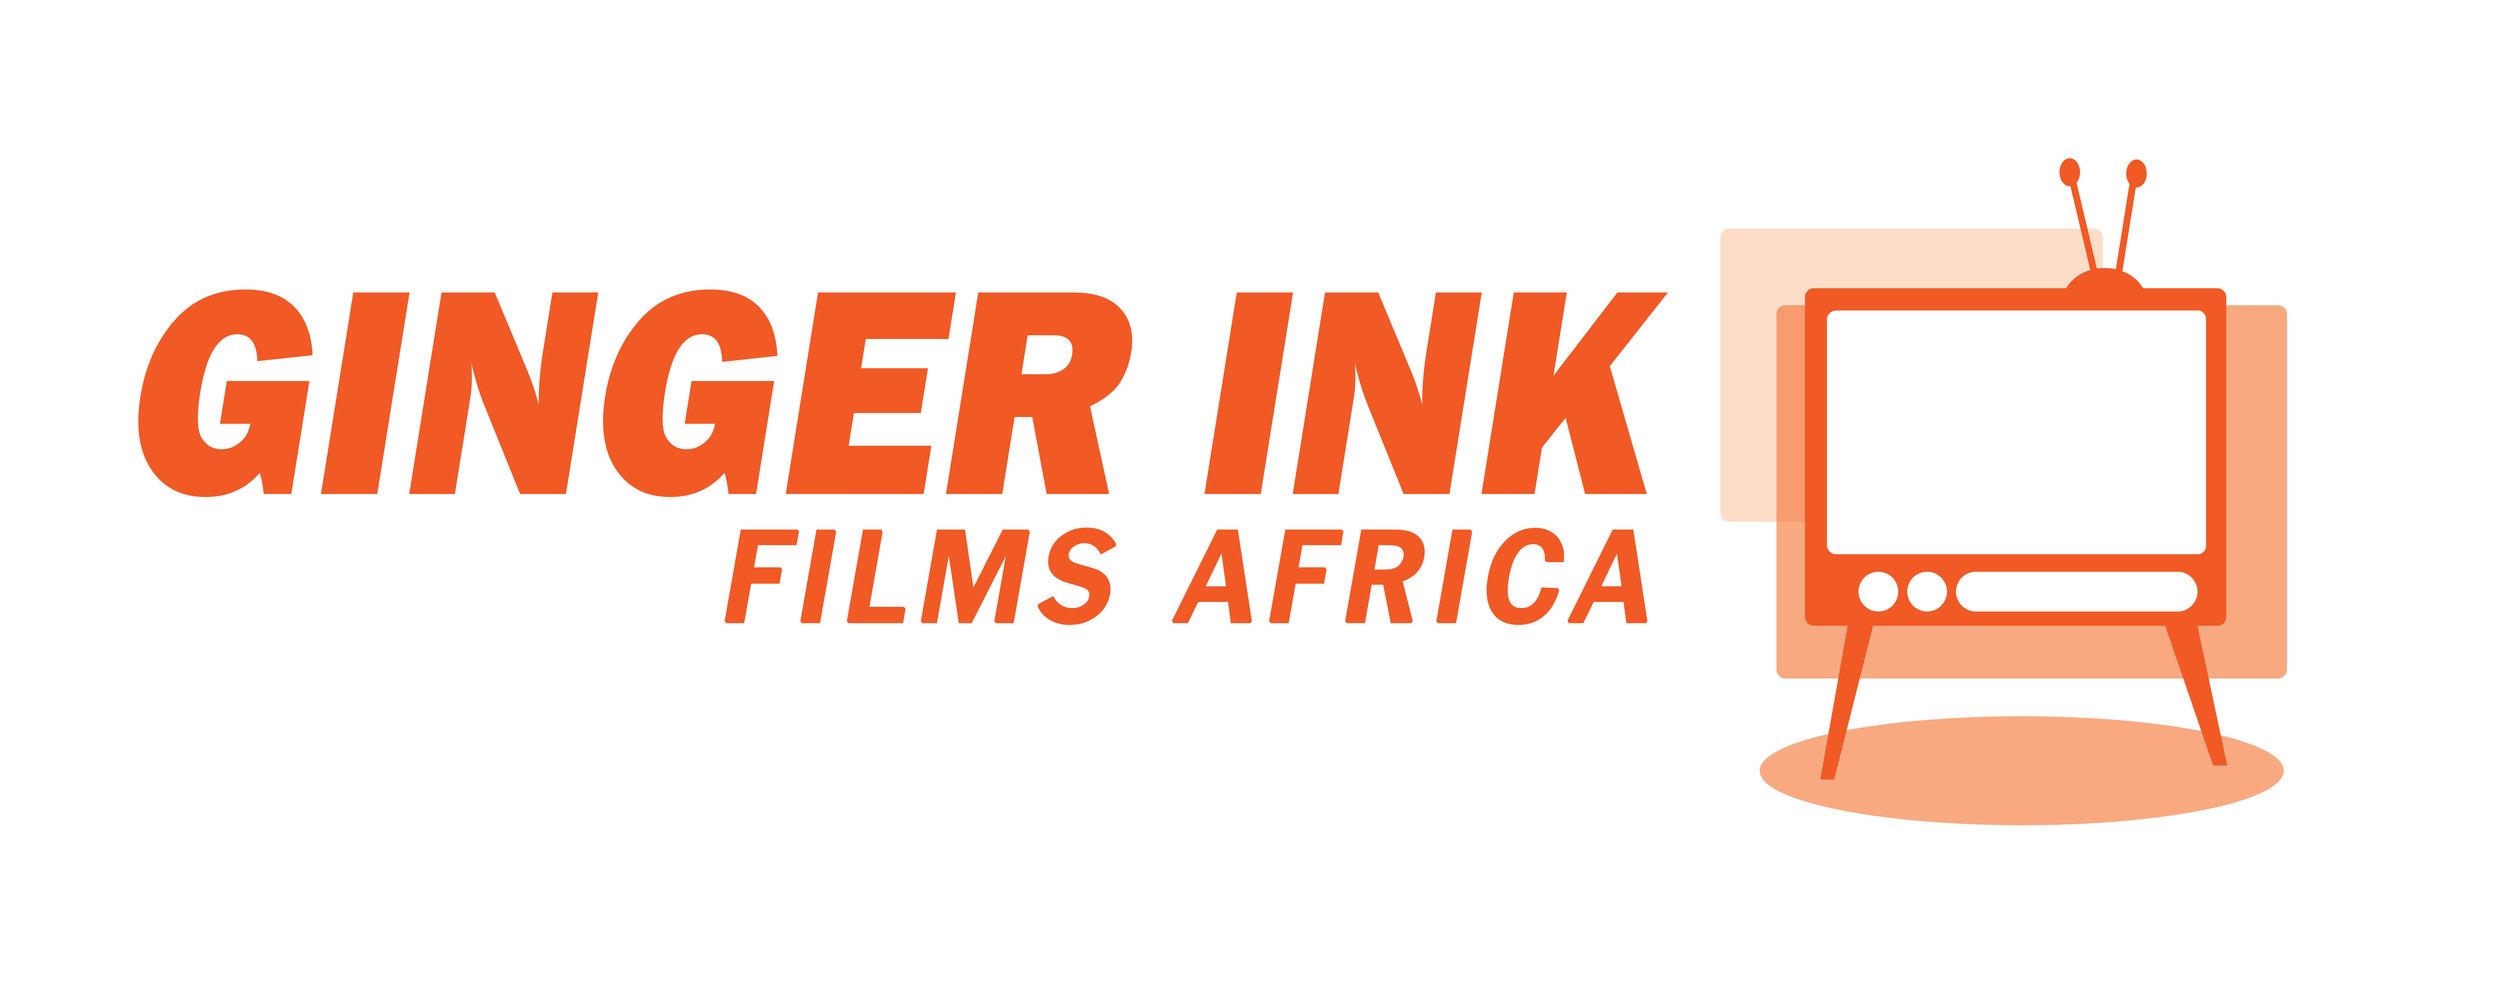 _Ginger Ink Films Africa Logo.jpg